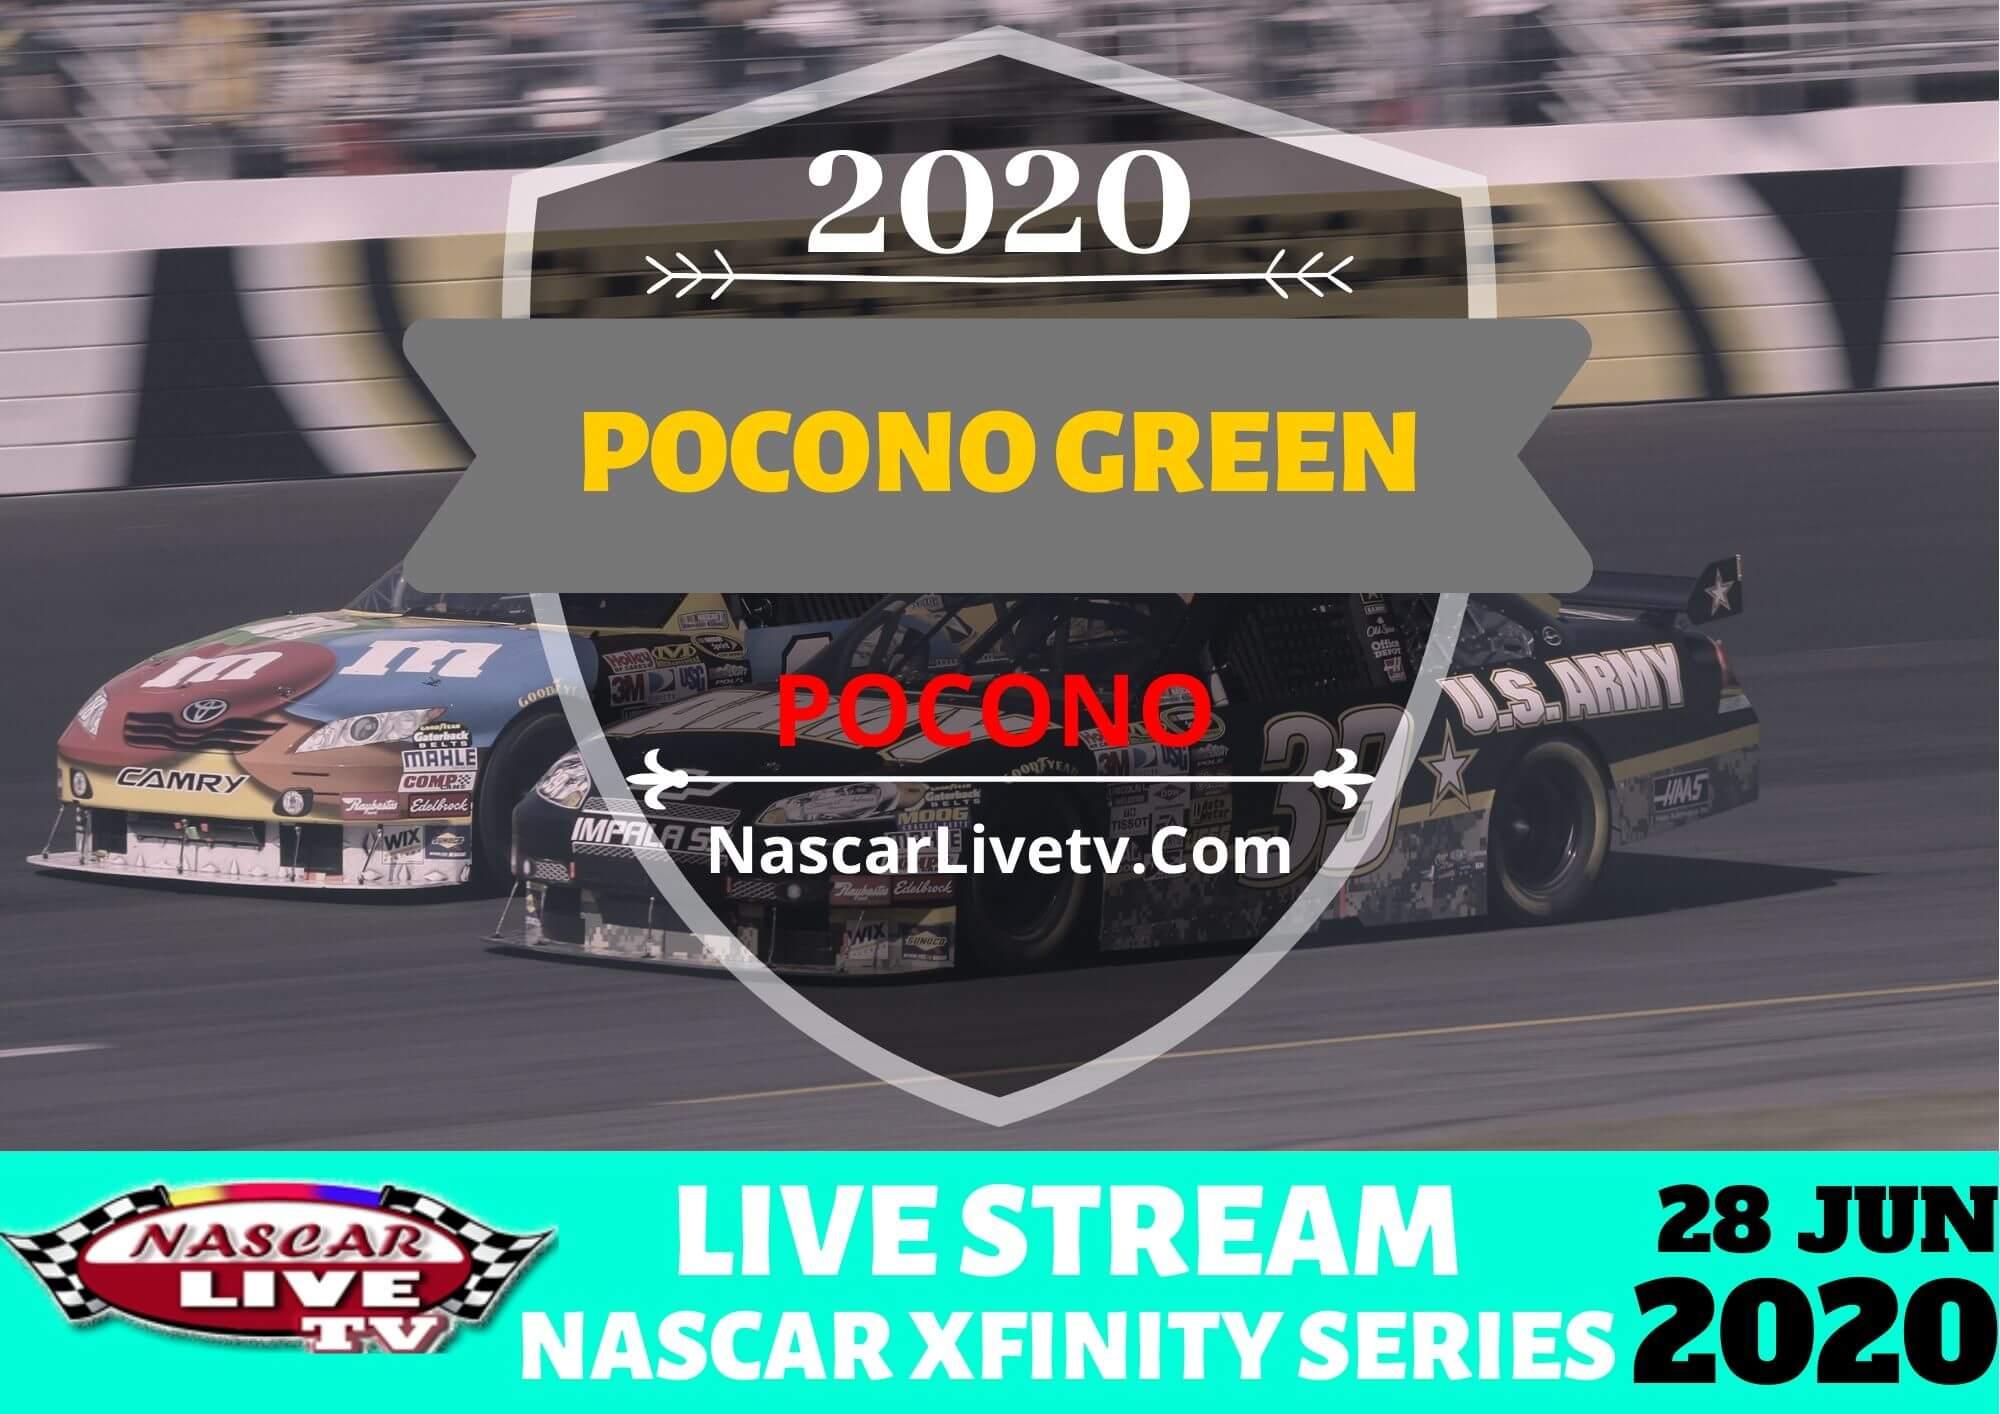 NXS Pocono Green 225 Recycled by J.P. Mascaro & Sons Live Stream 2020